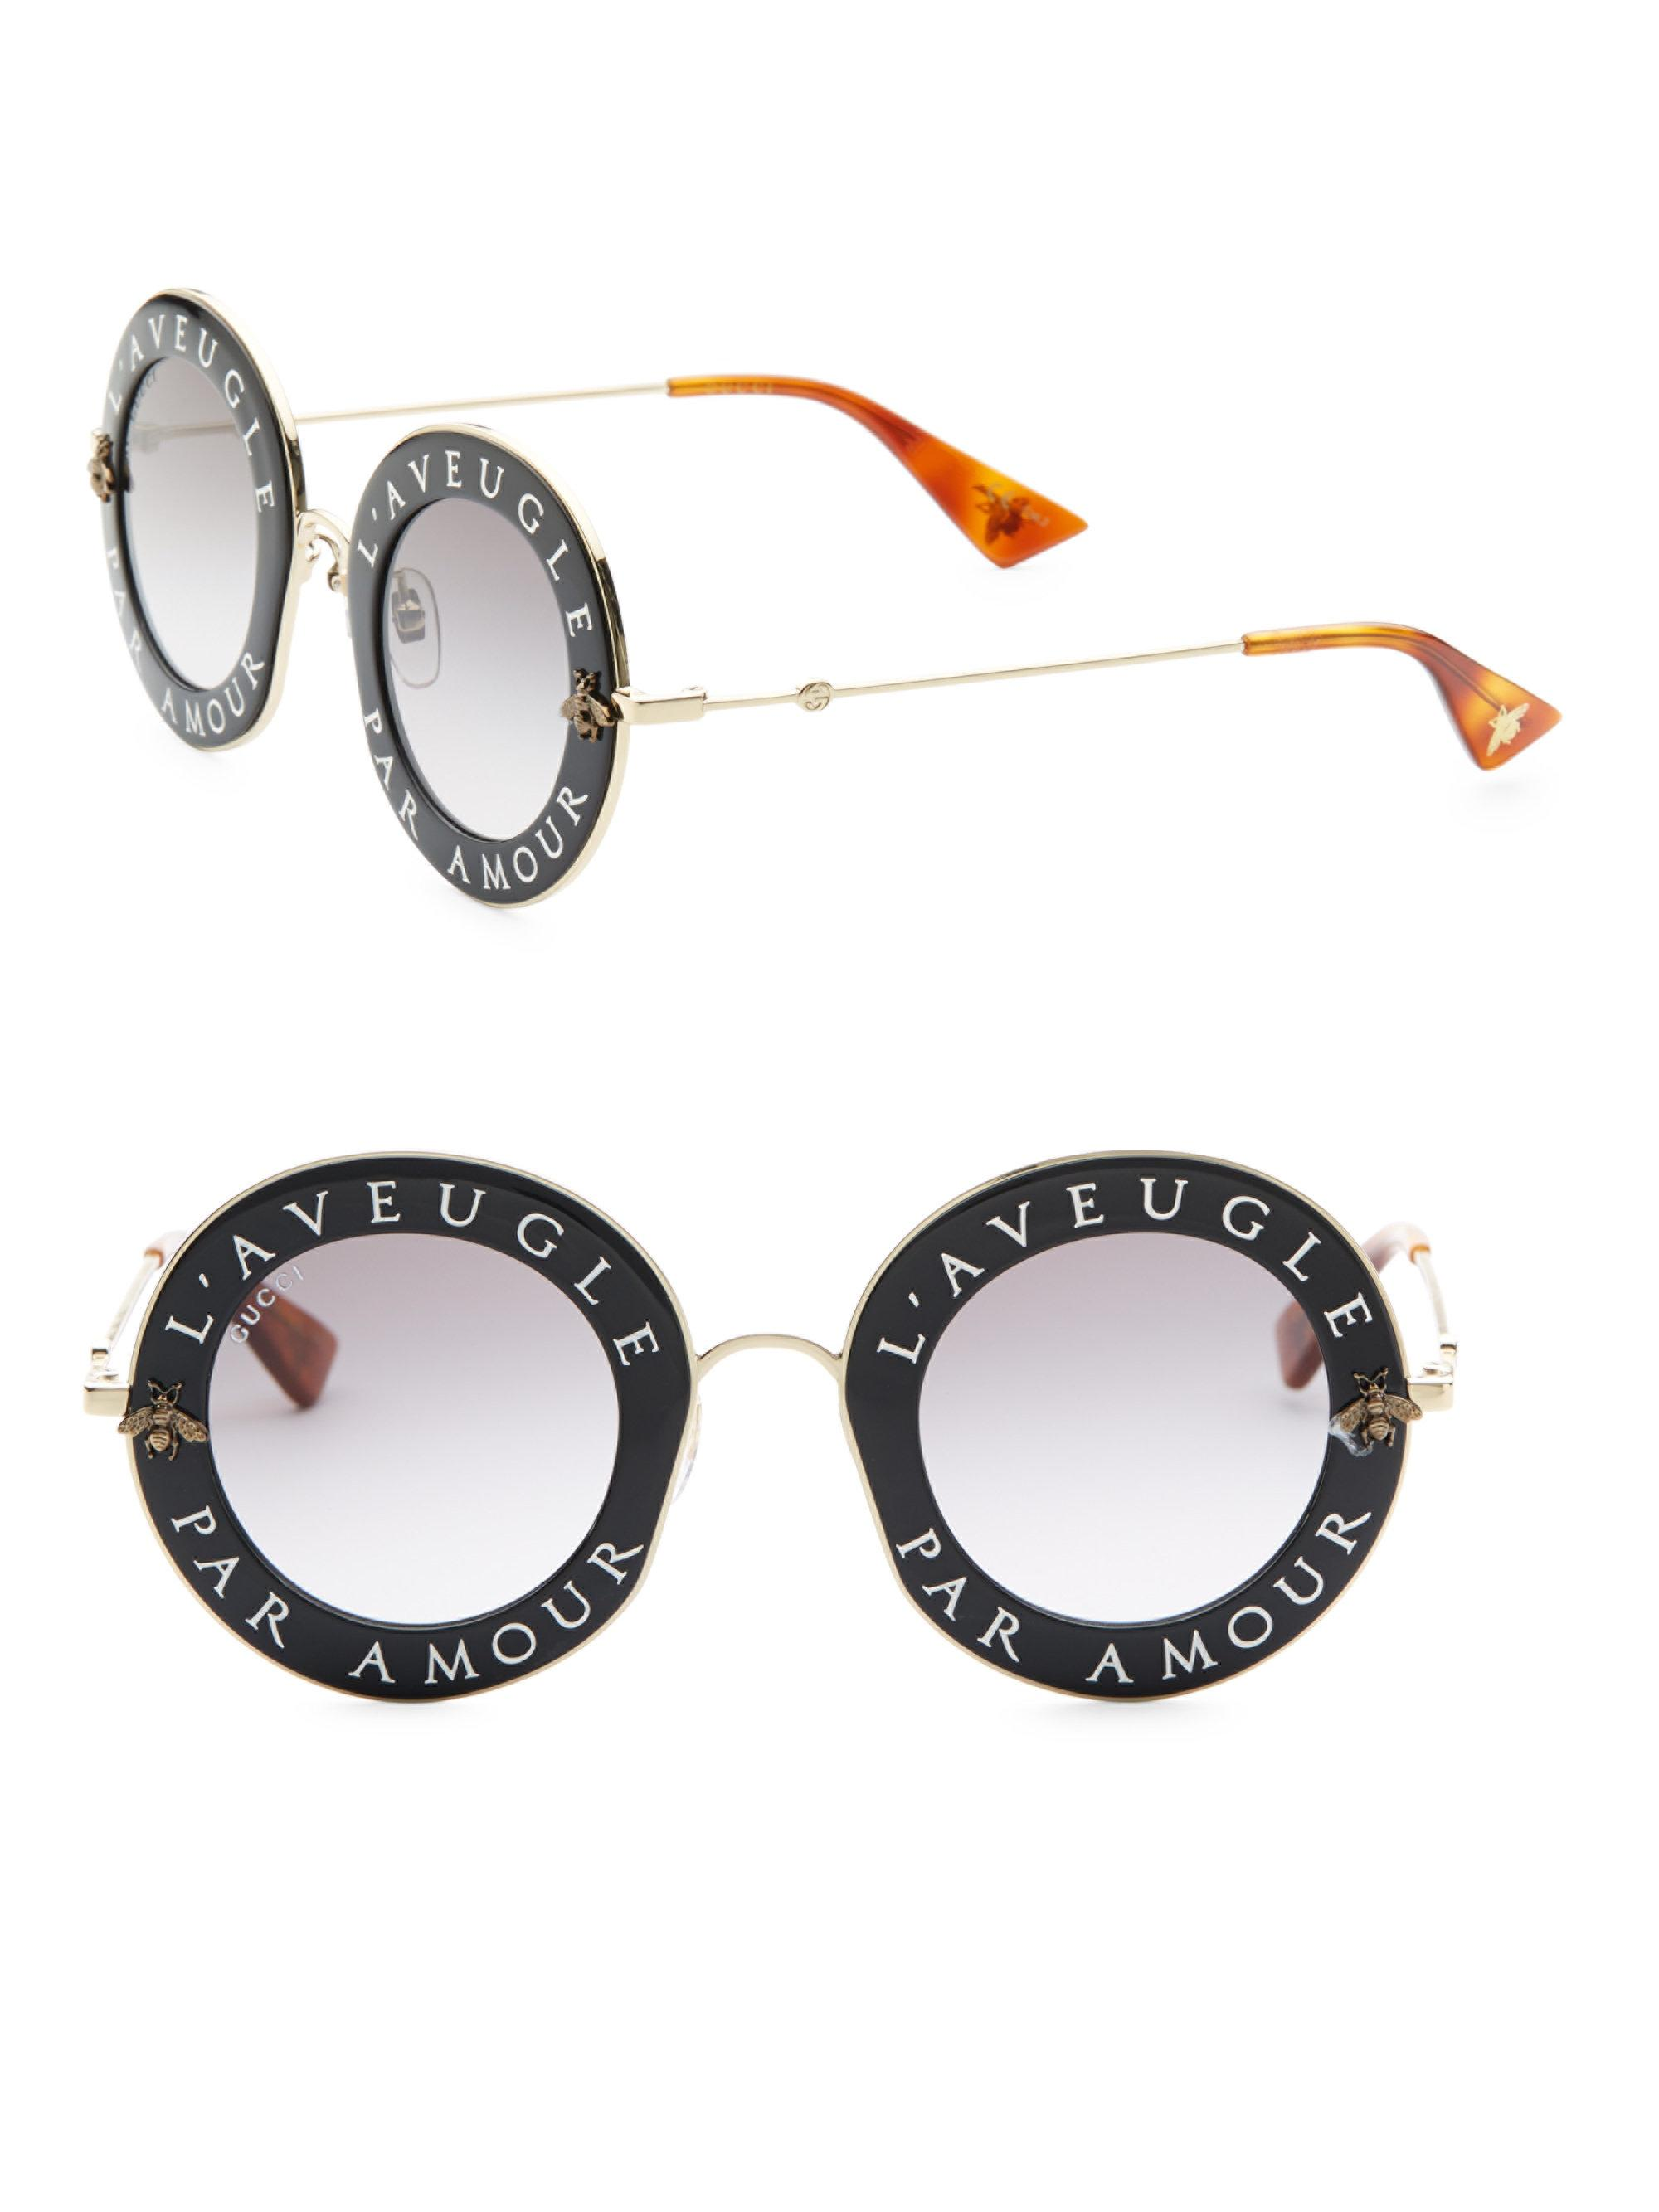 354296dd8290 Lyst - Gucci 44mm L aveugle Par Amour Round Sunglasses in Black